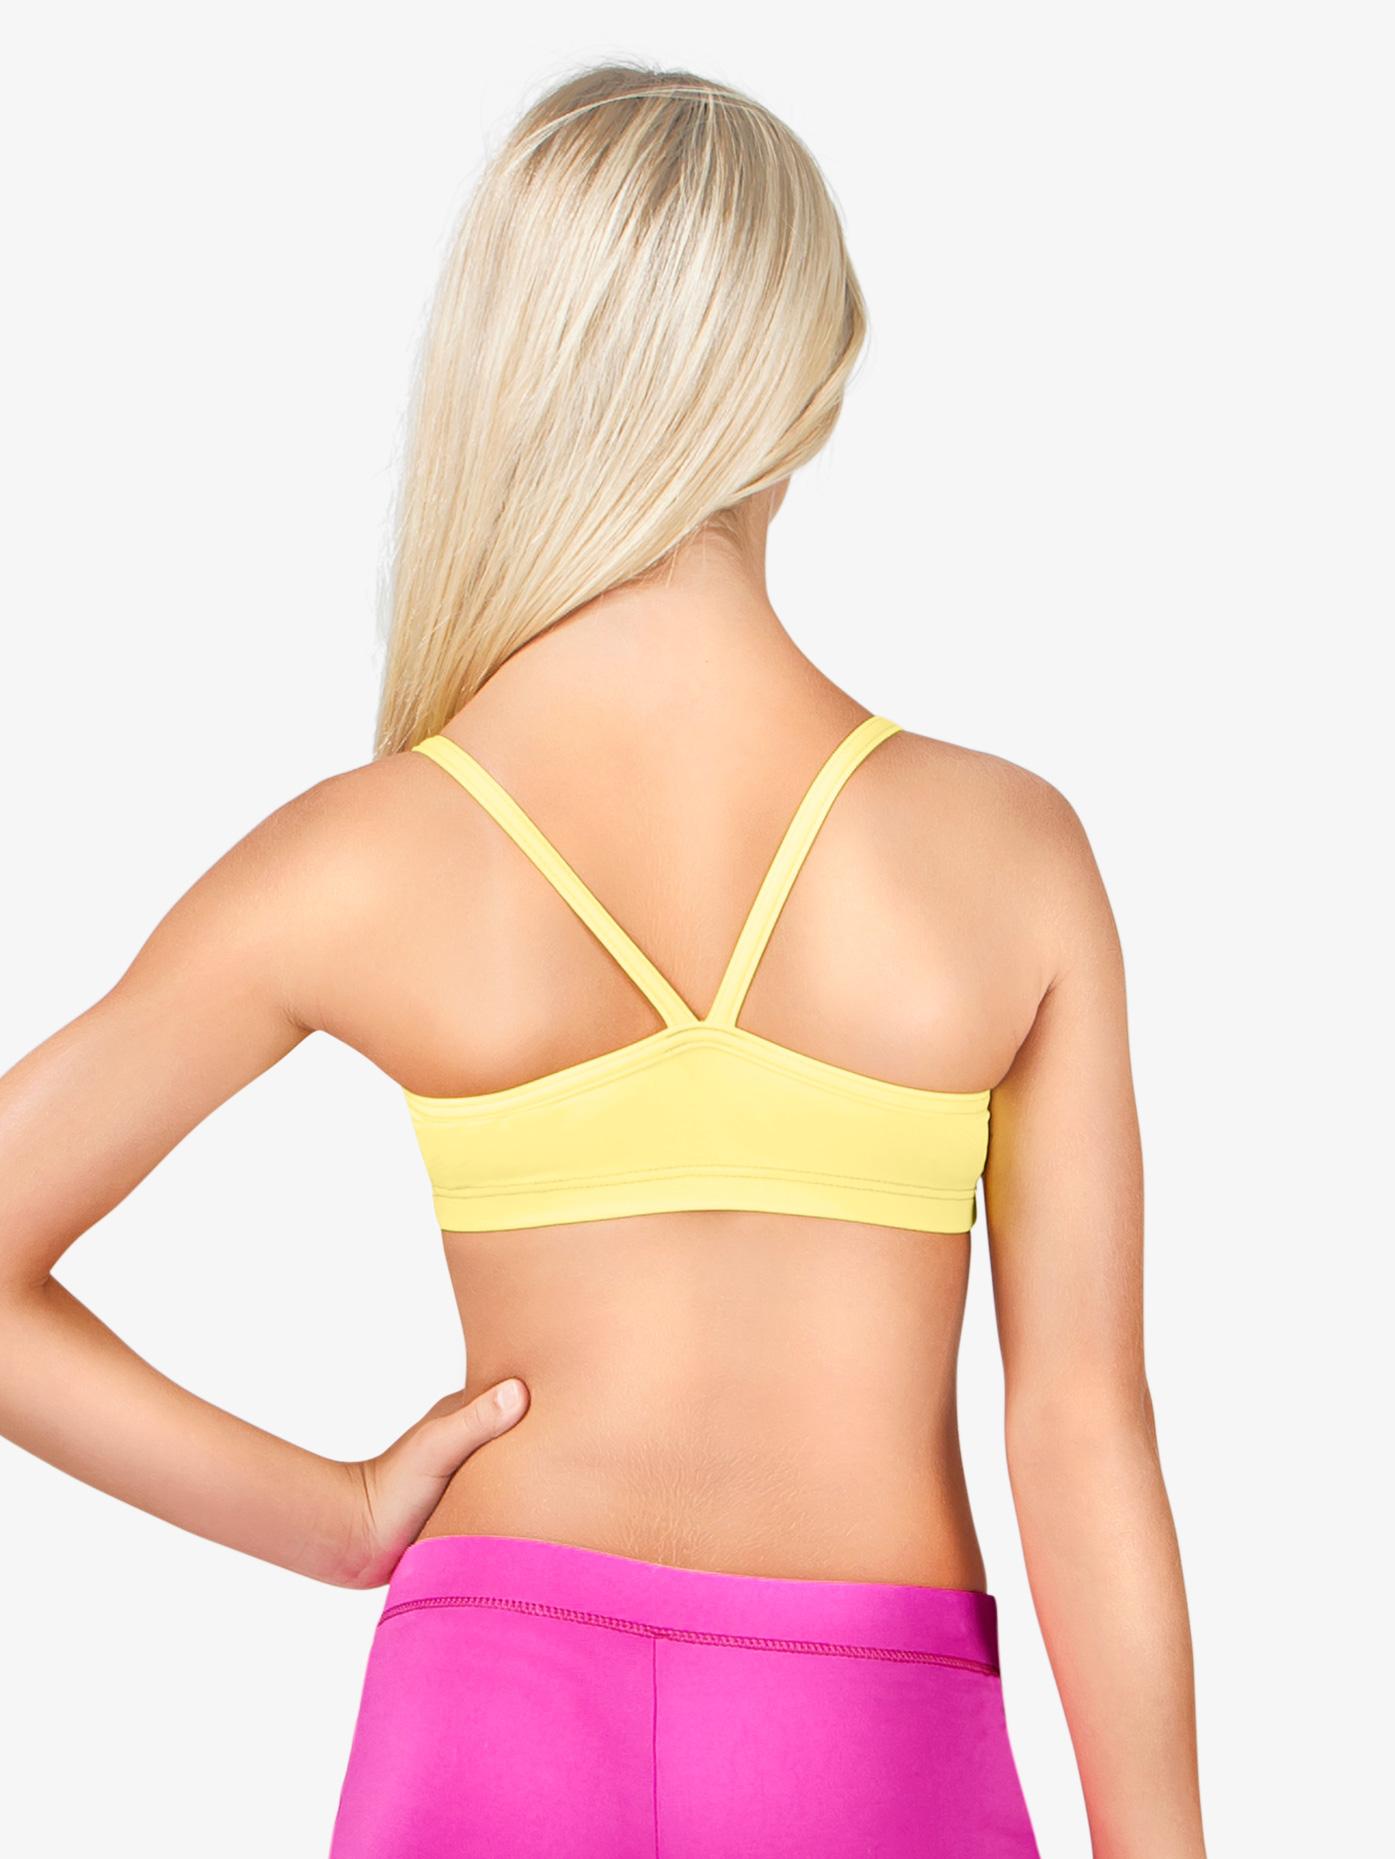 Motionwear Girls V-Back Camisole Bra Top M3087C